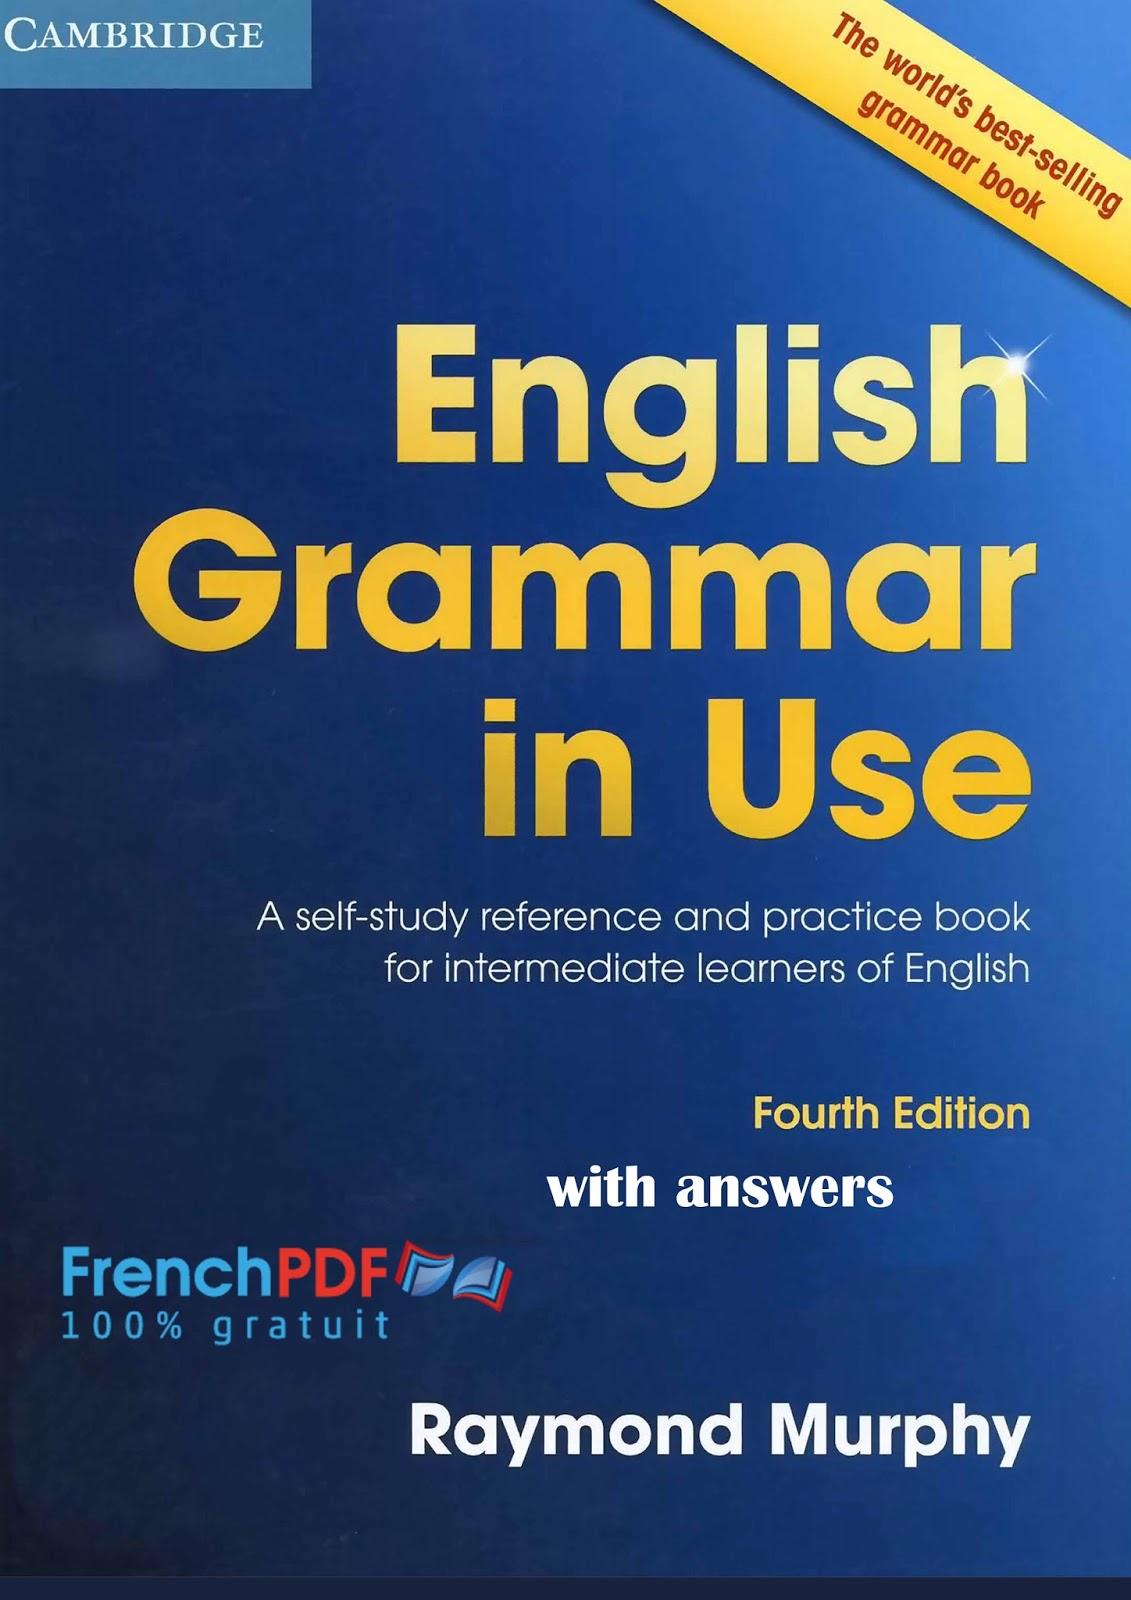 Essential Grammar In Use Pdf : essential, grammar, Raymond, Murphy, English, Grammar, Online, Lasopacentre